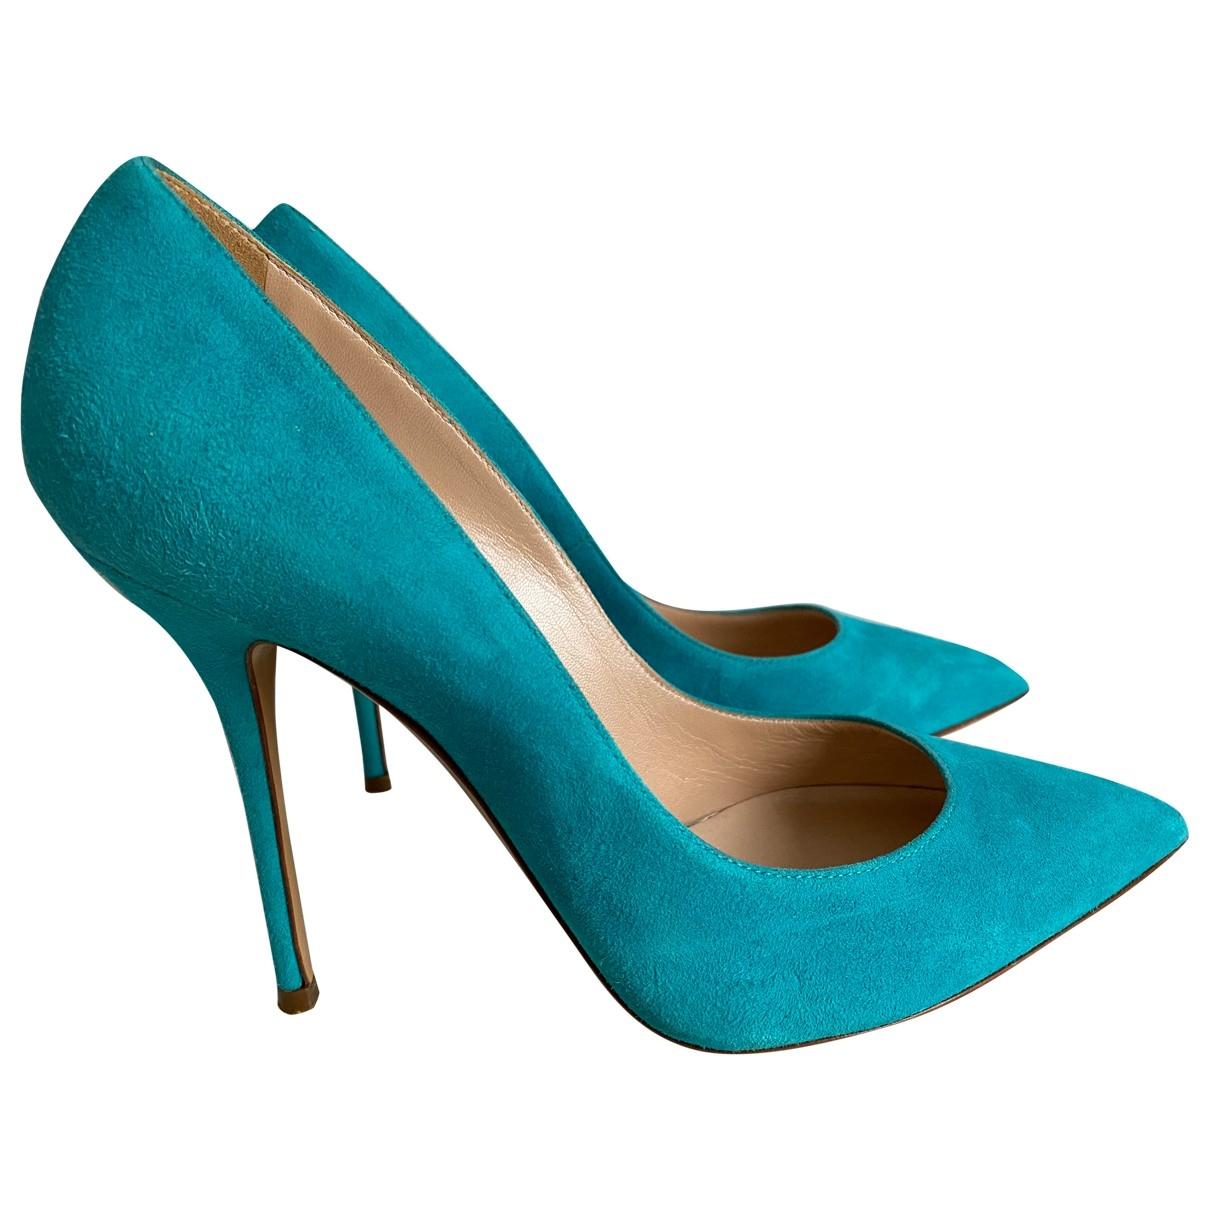 Casadei \N Turquoise Suede Heels for Women 38 EU